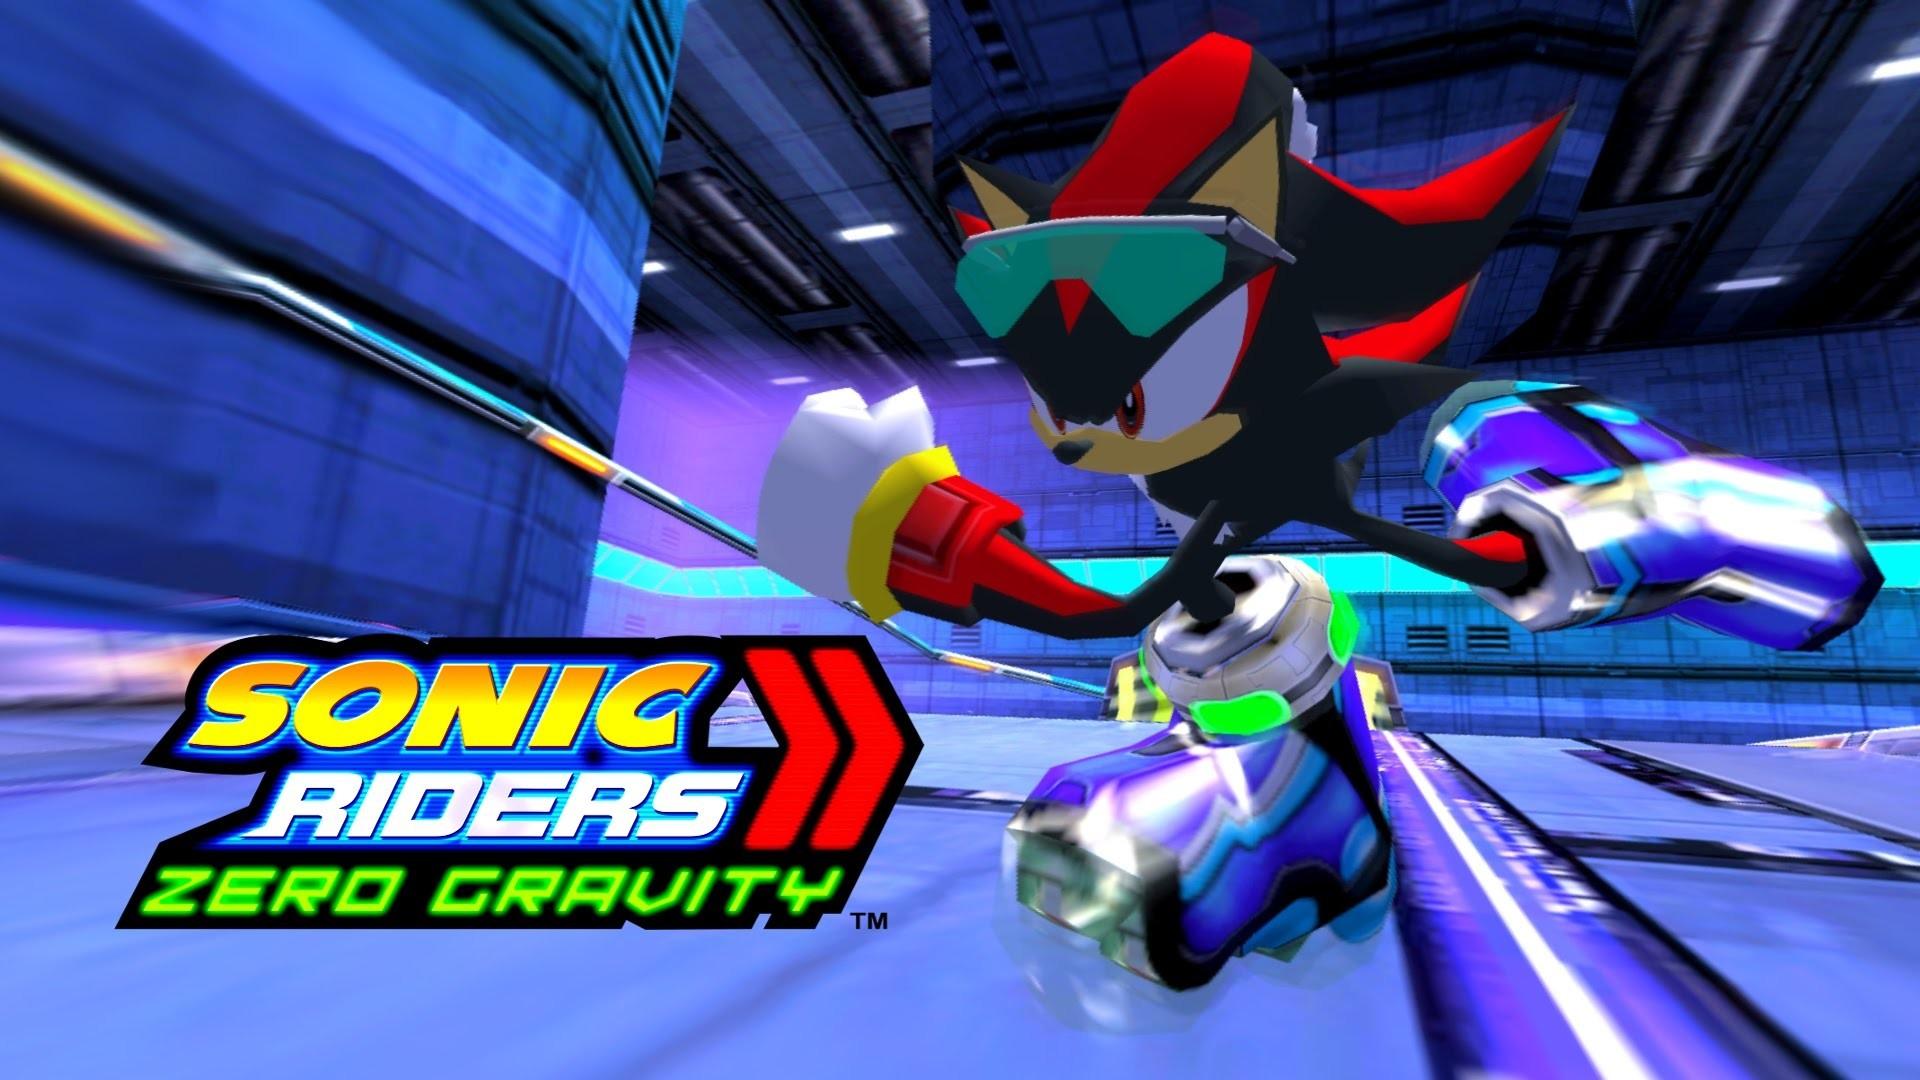 Sonic Riders Zero Gravity Wallpapers